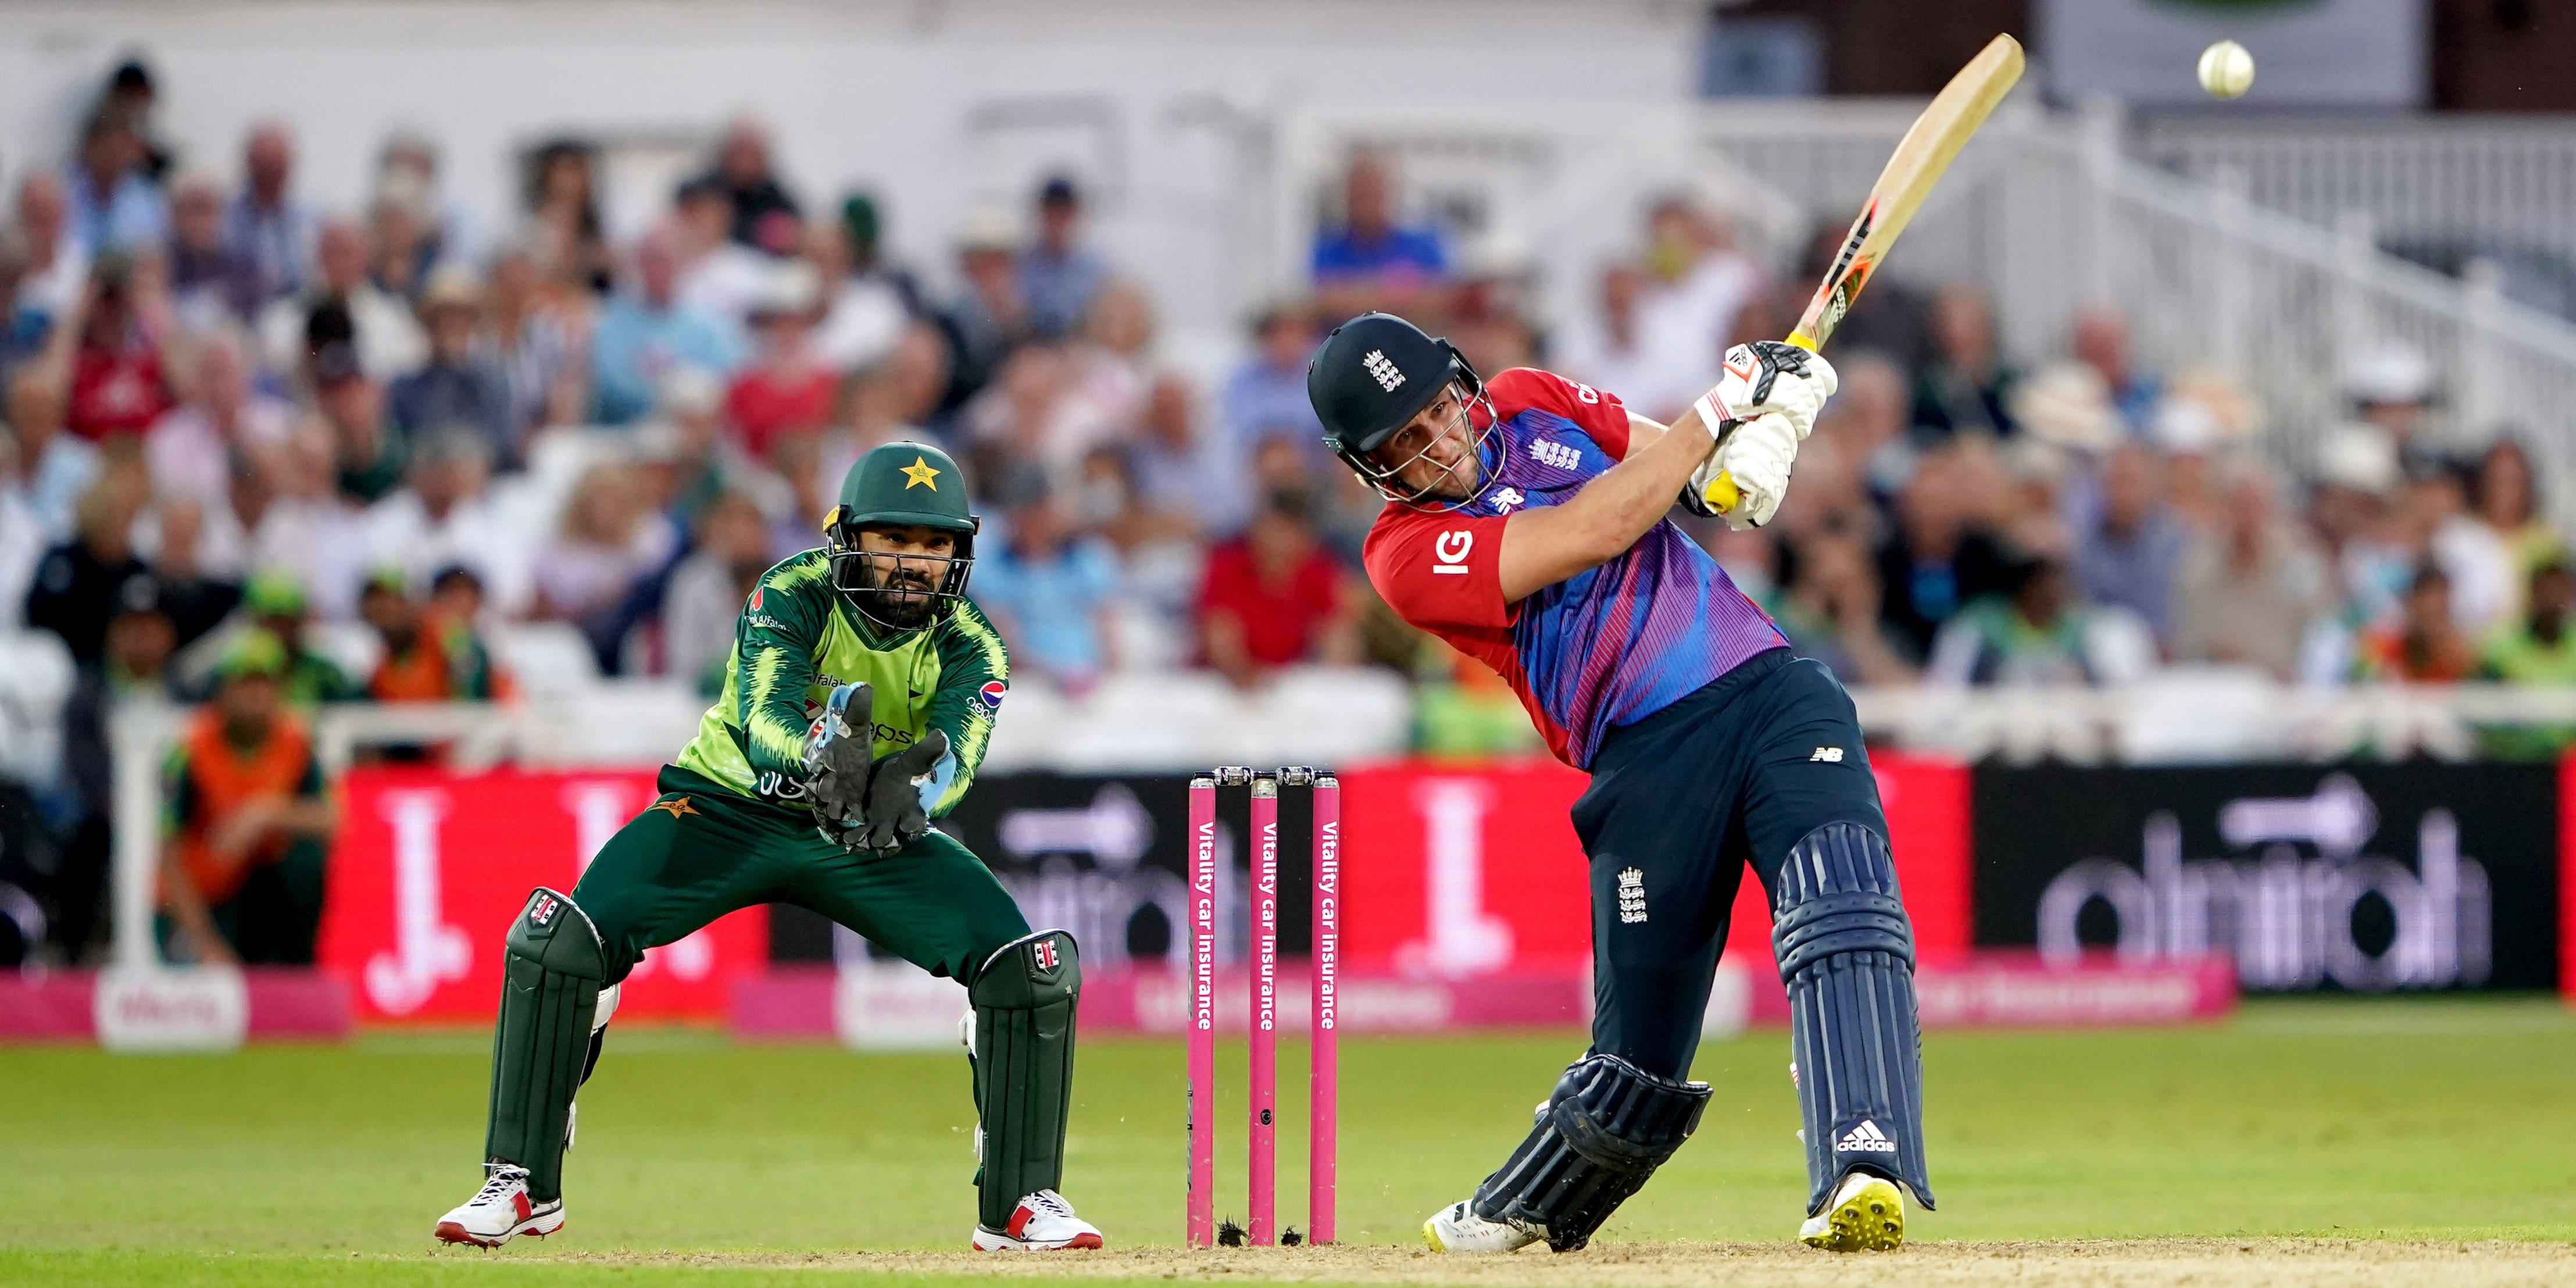 Liam Livingstone century in vain as Pakistan beat England in high-scoring opener - Cricket365